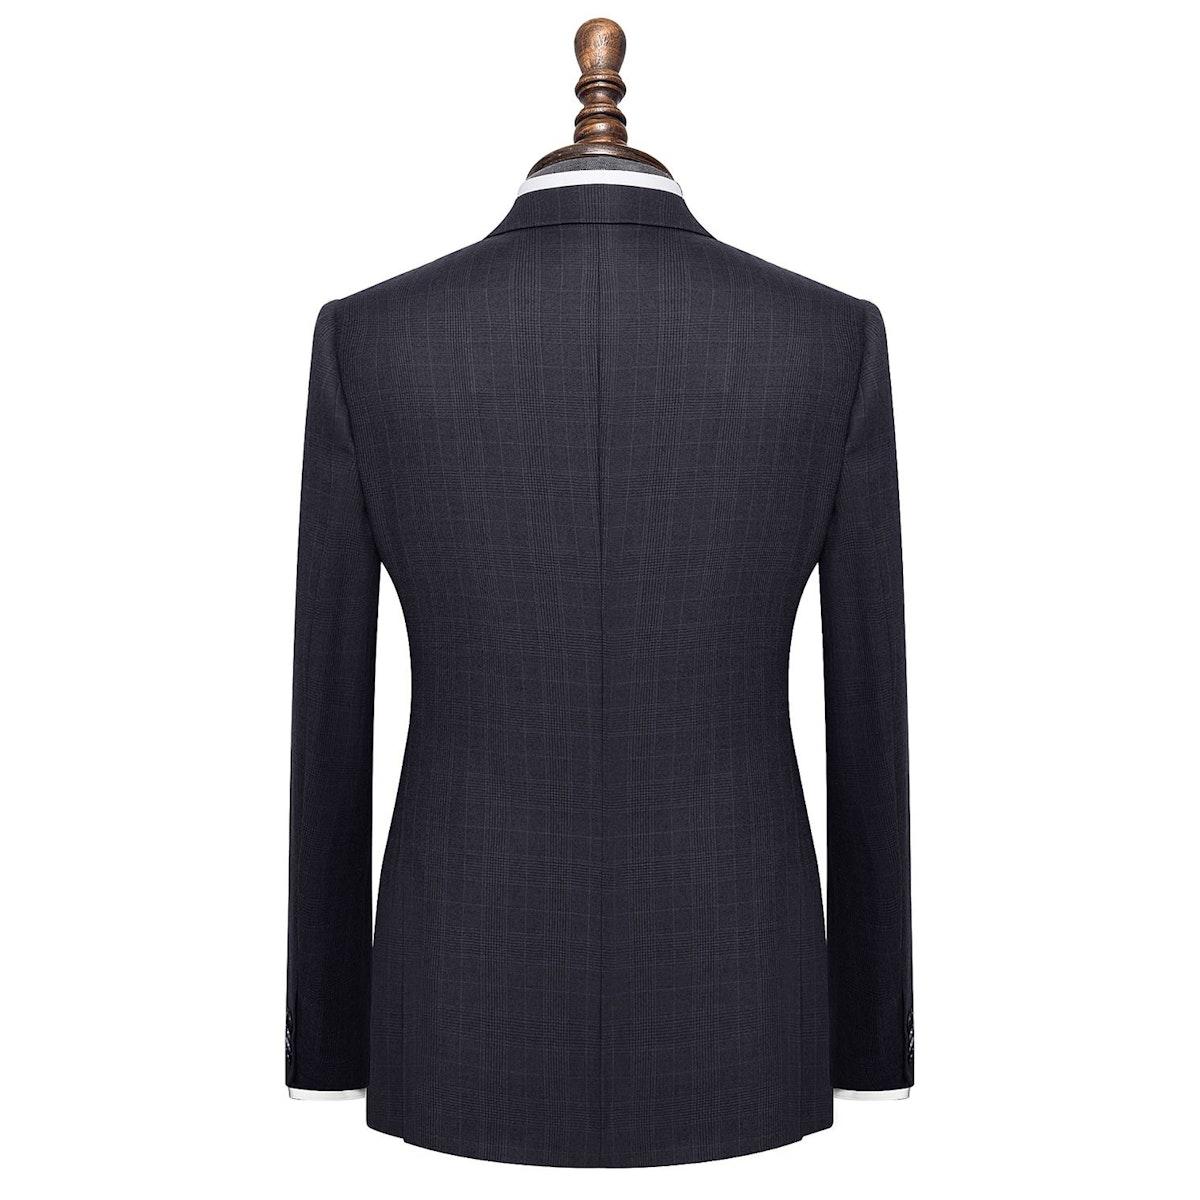 InStitchu Collection Kilter Blue Glen Plaid Wool Jacket